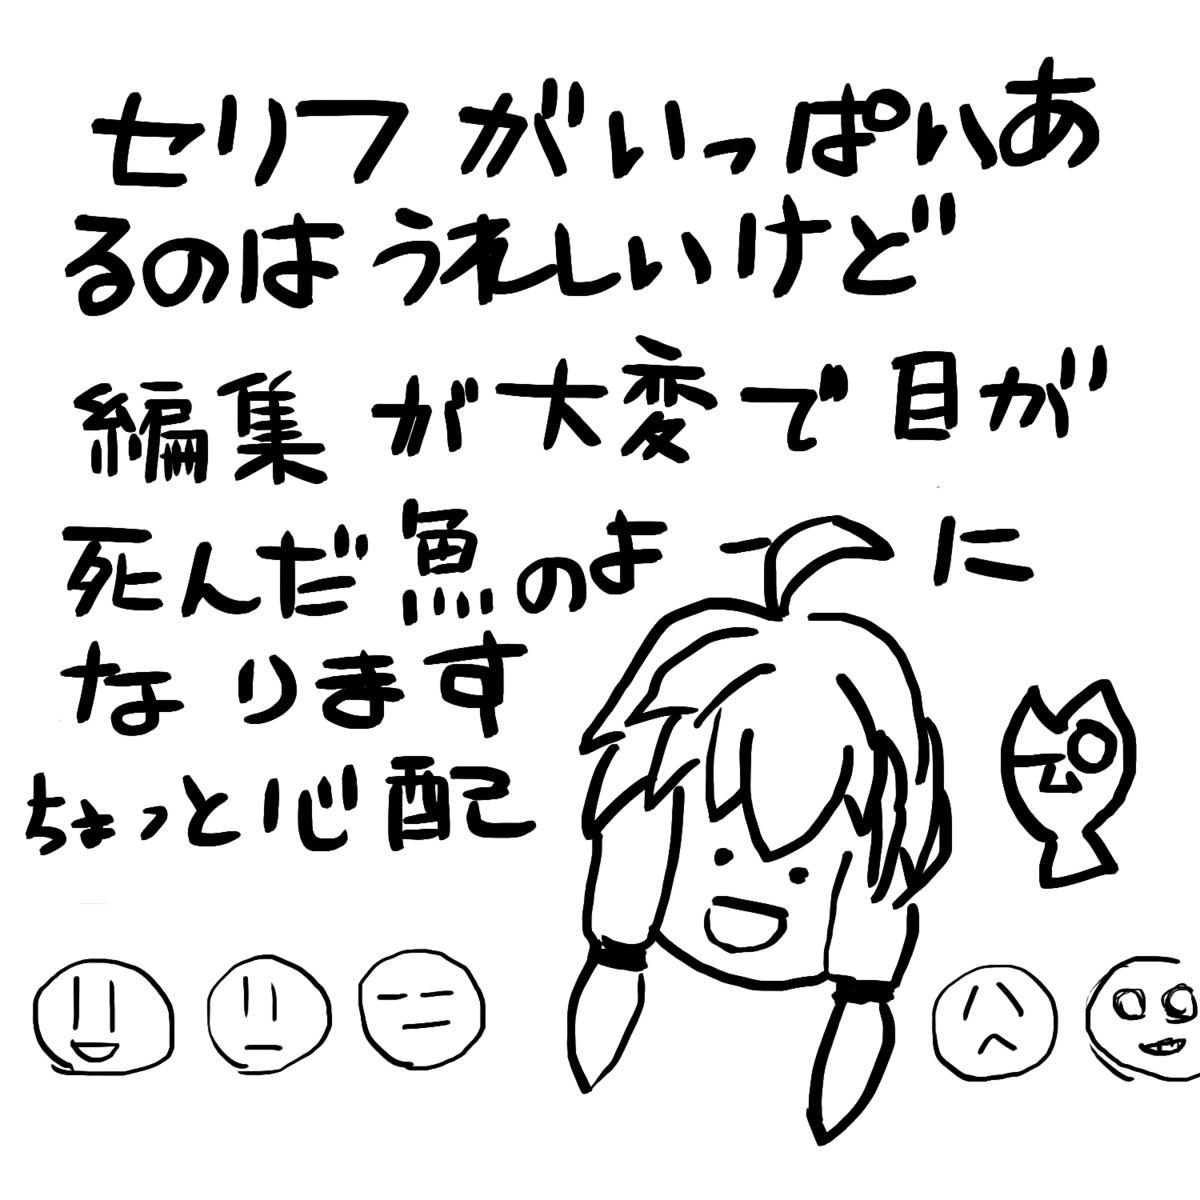 f:id:zomuzomu:20200116103145p:plain